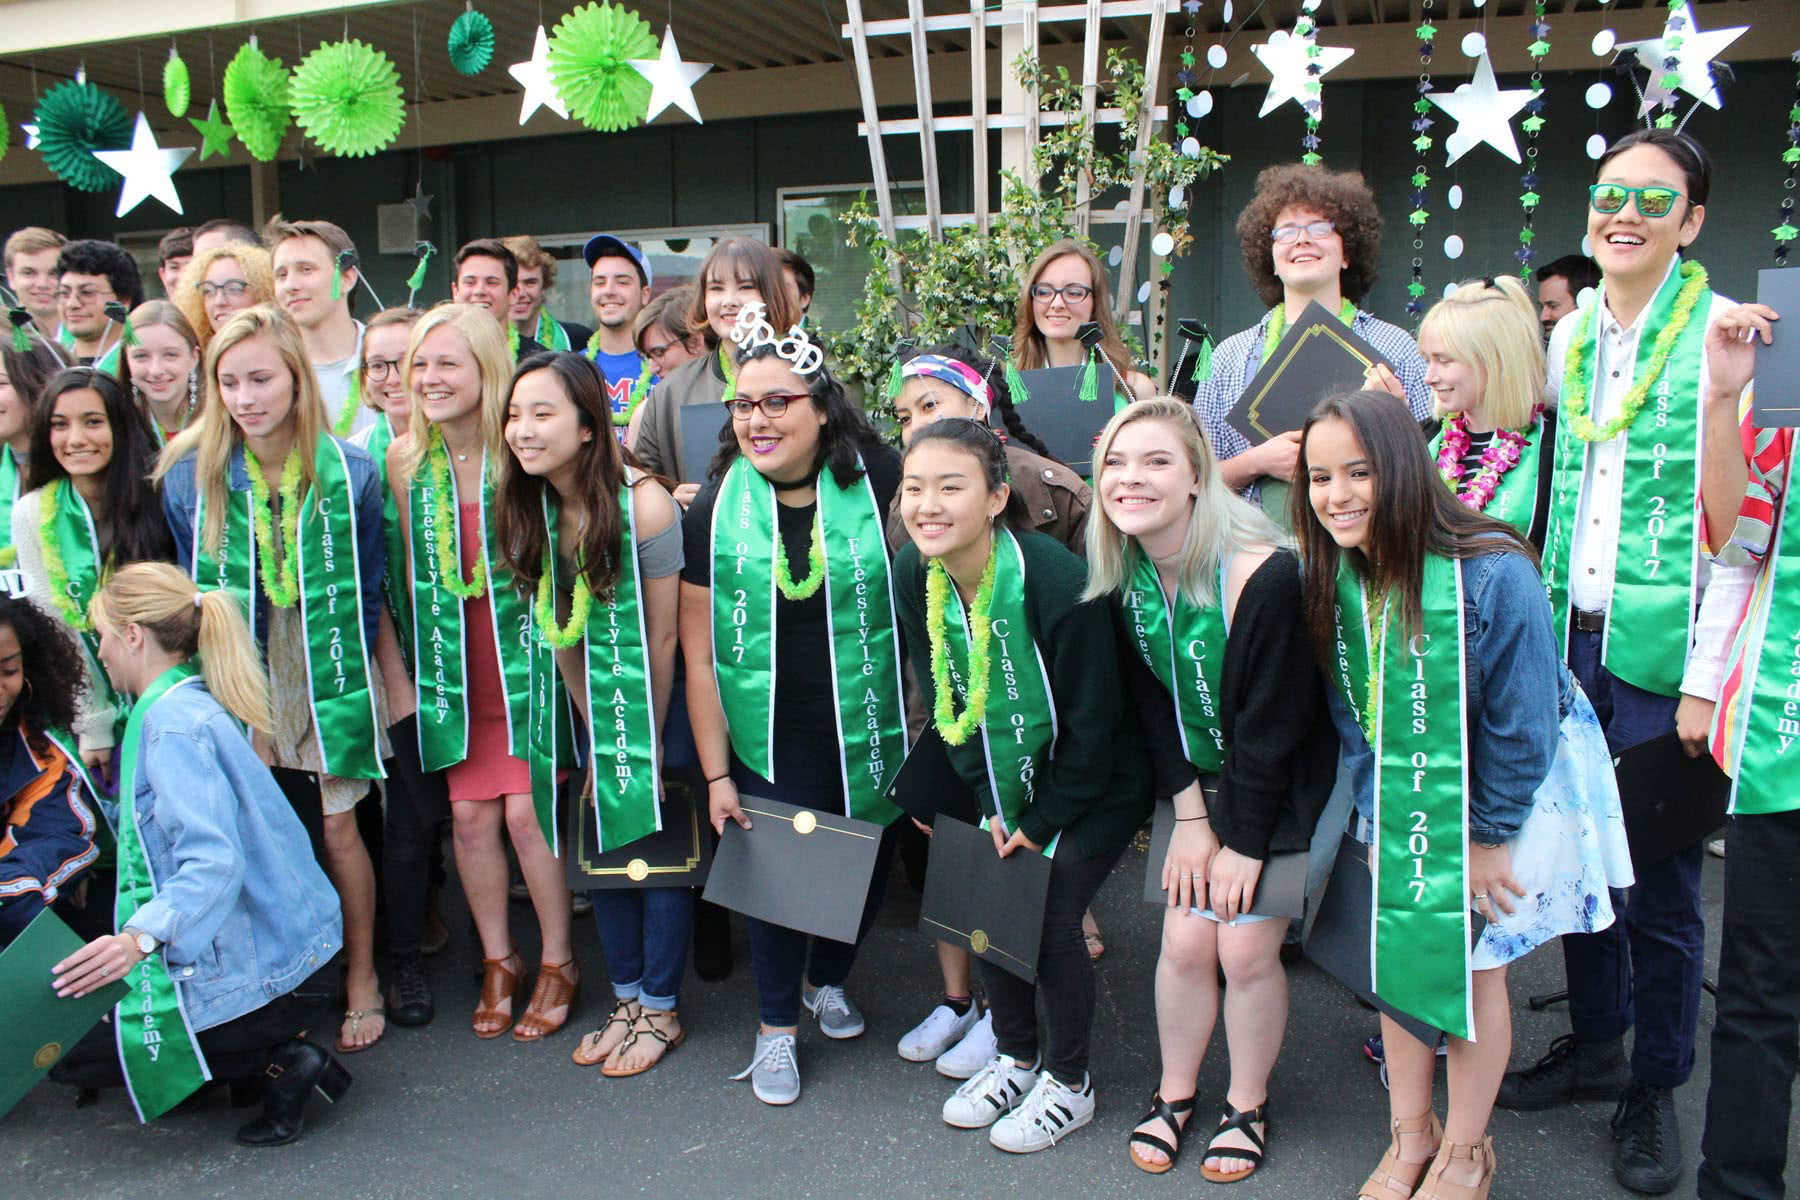 2017freestylegraduation 479